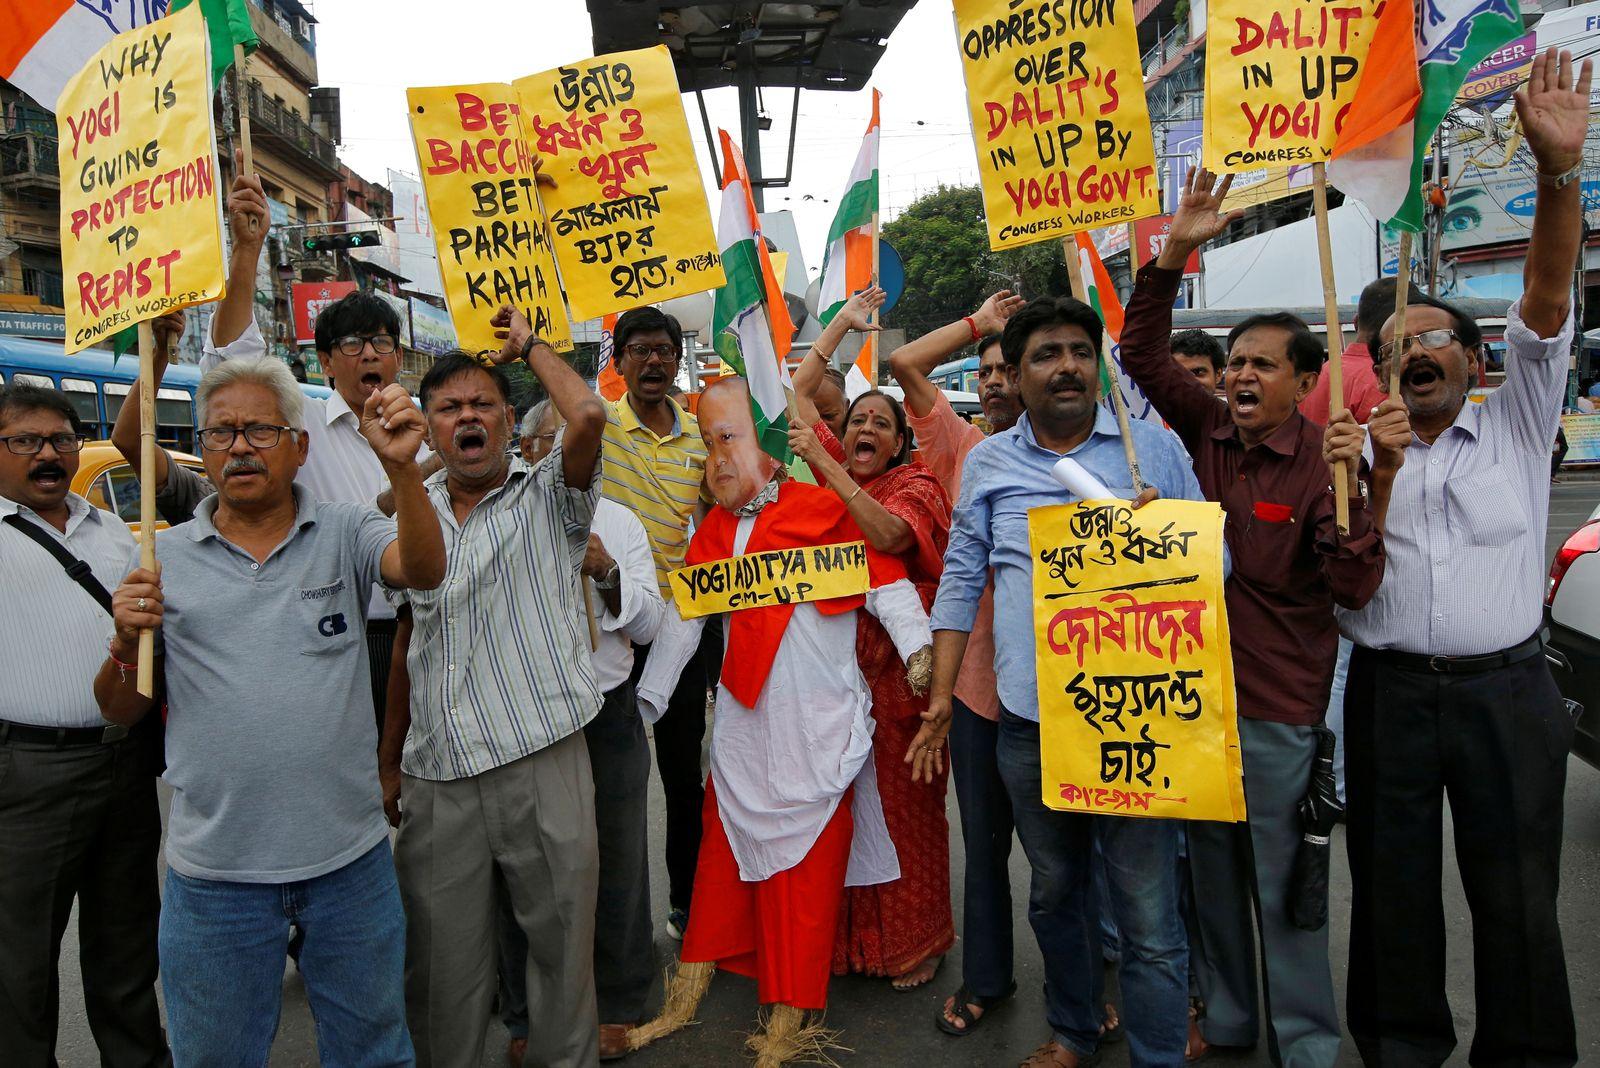 INDIA-POLITICS/RAPE